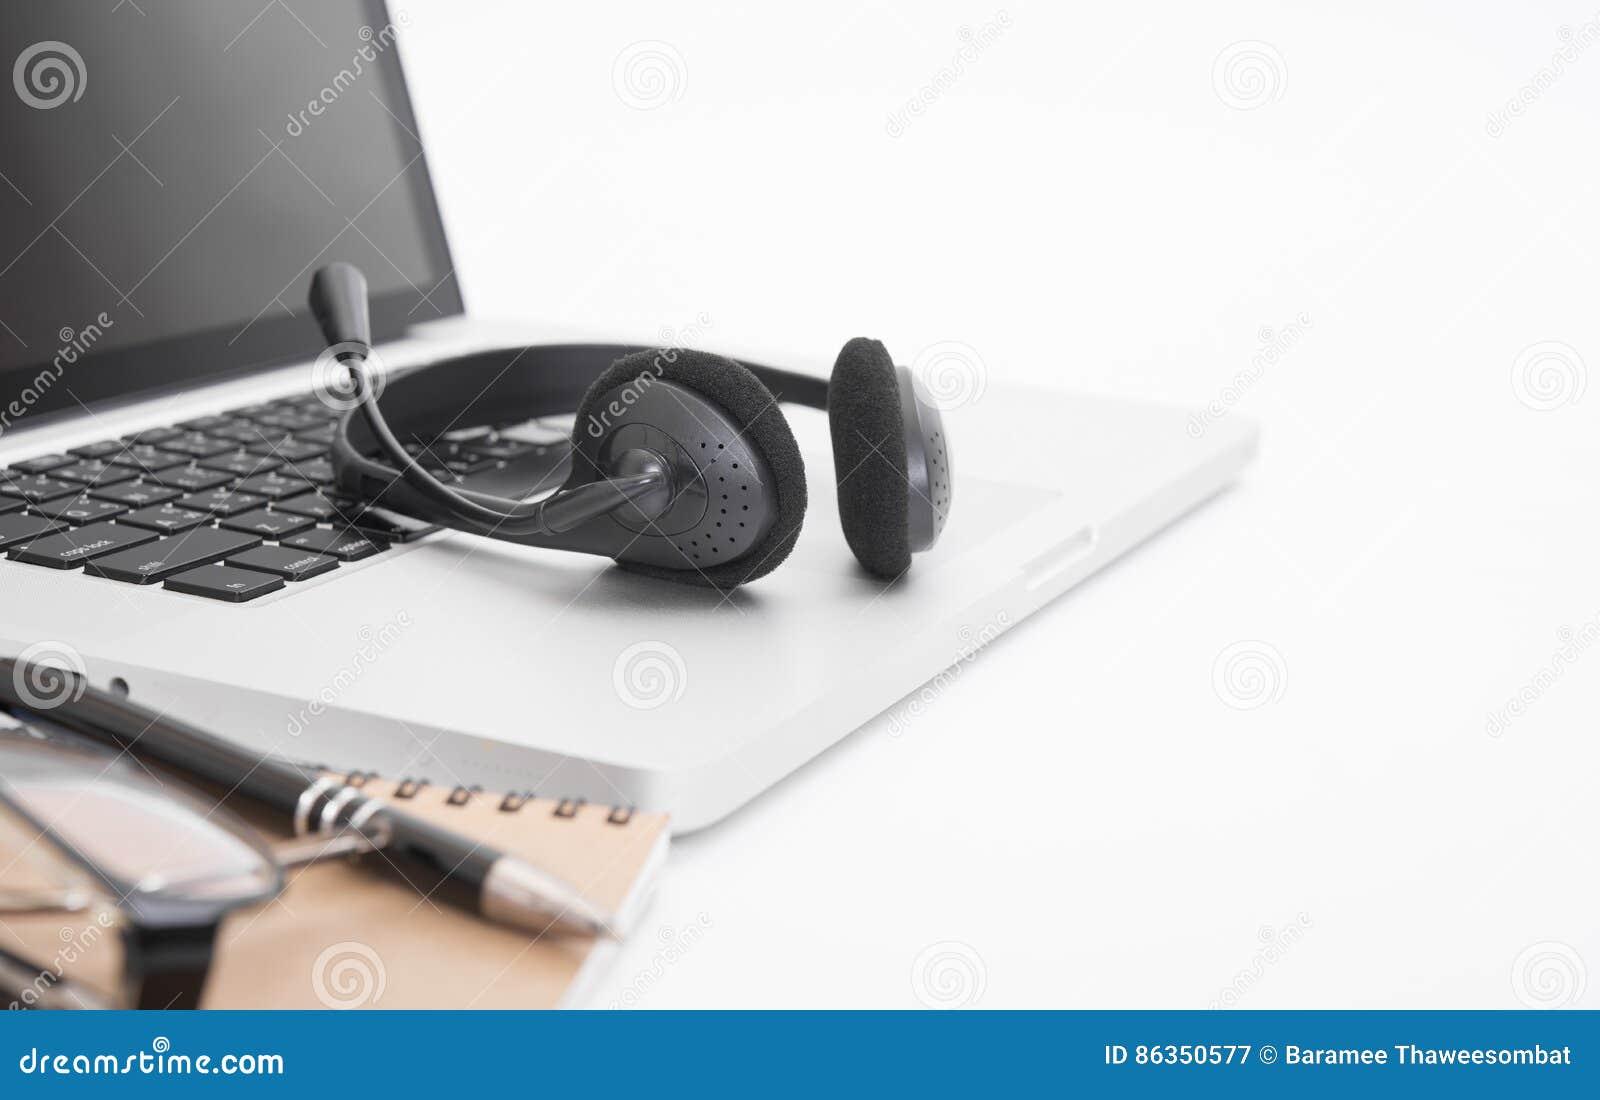 Bureau moderne avec l ordinateur carnet casque image stock